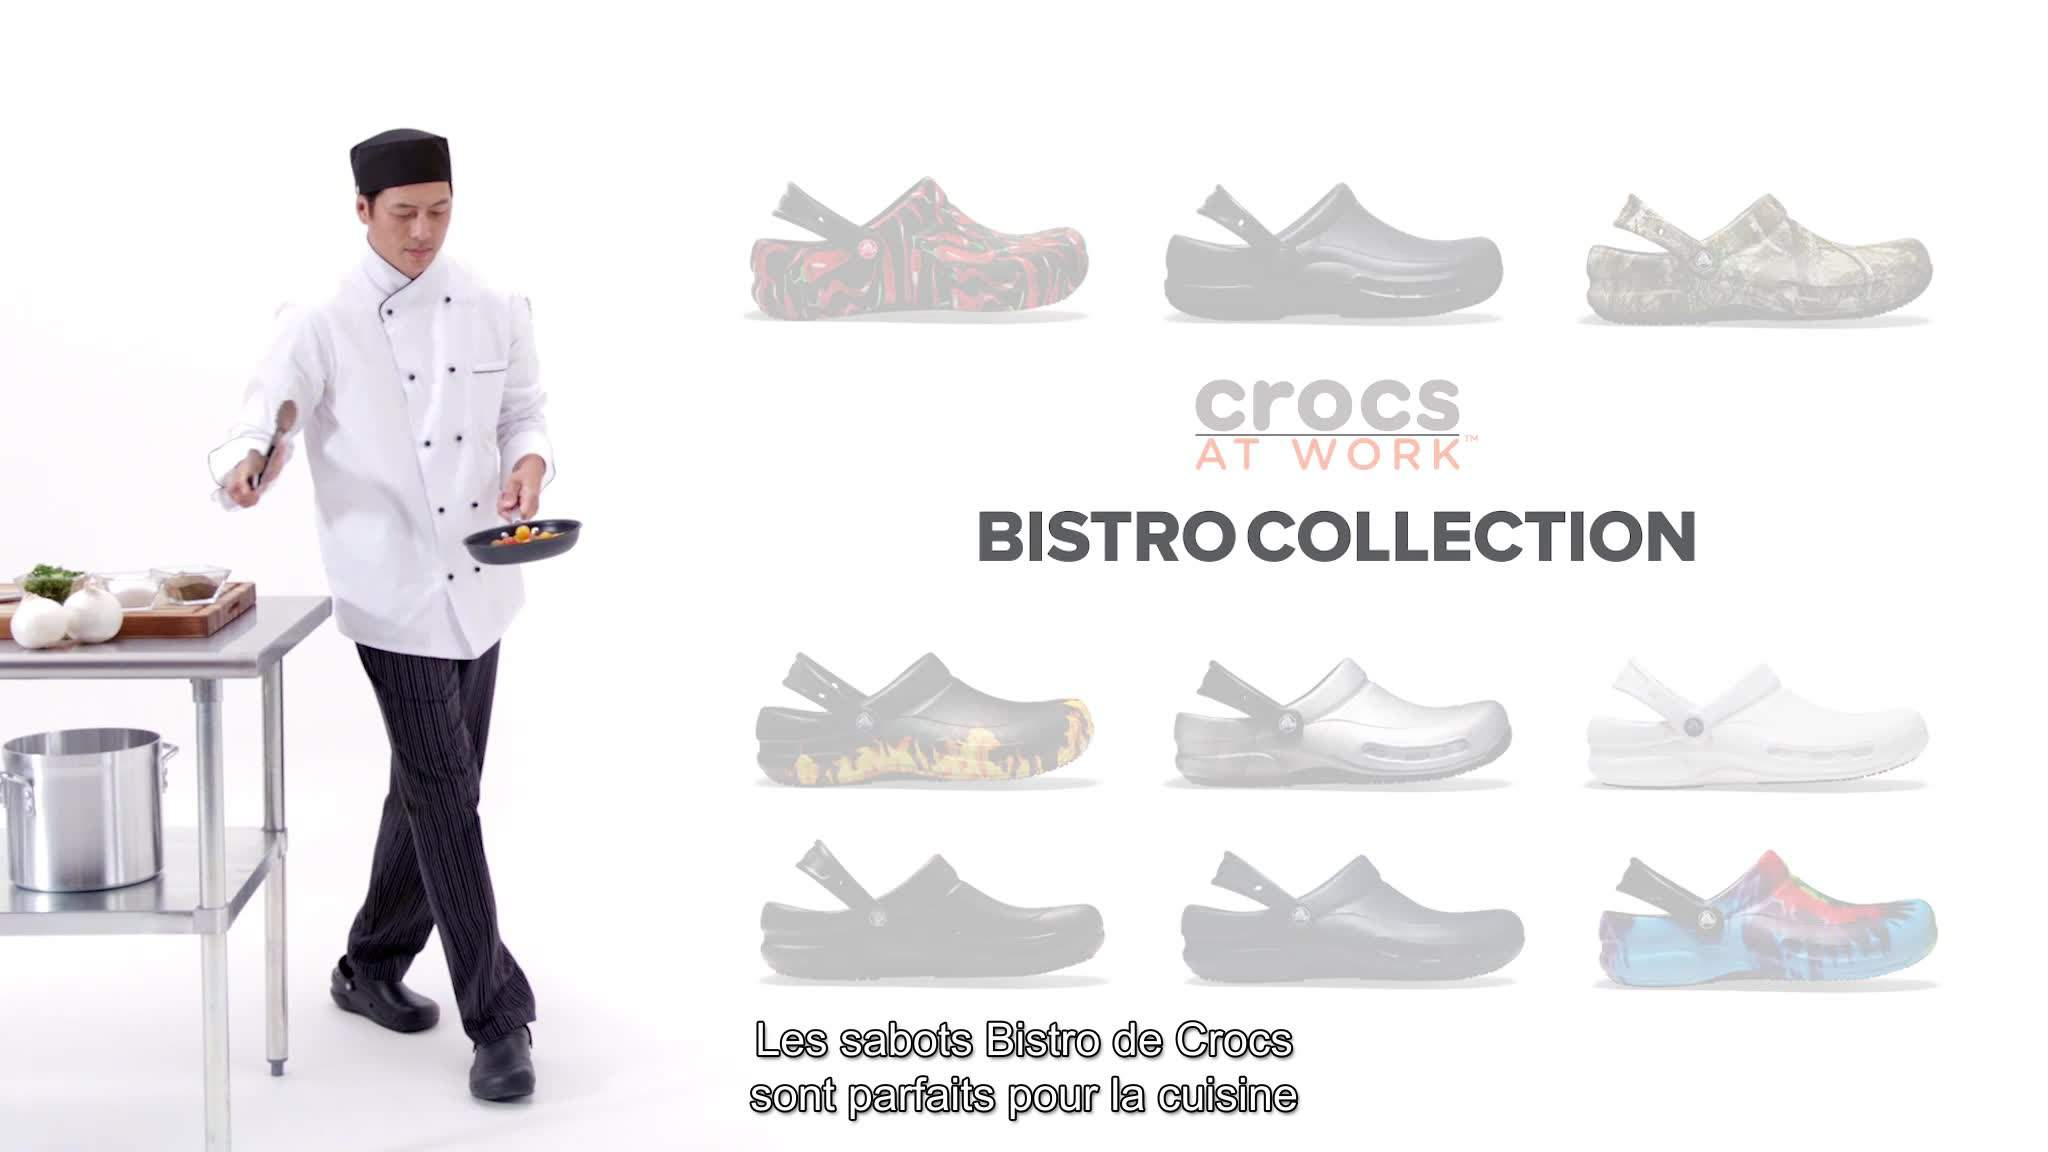 Crocs Crocs Crocs Crocs Crocs Crocs Crocs pvgnxwqUw